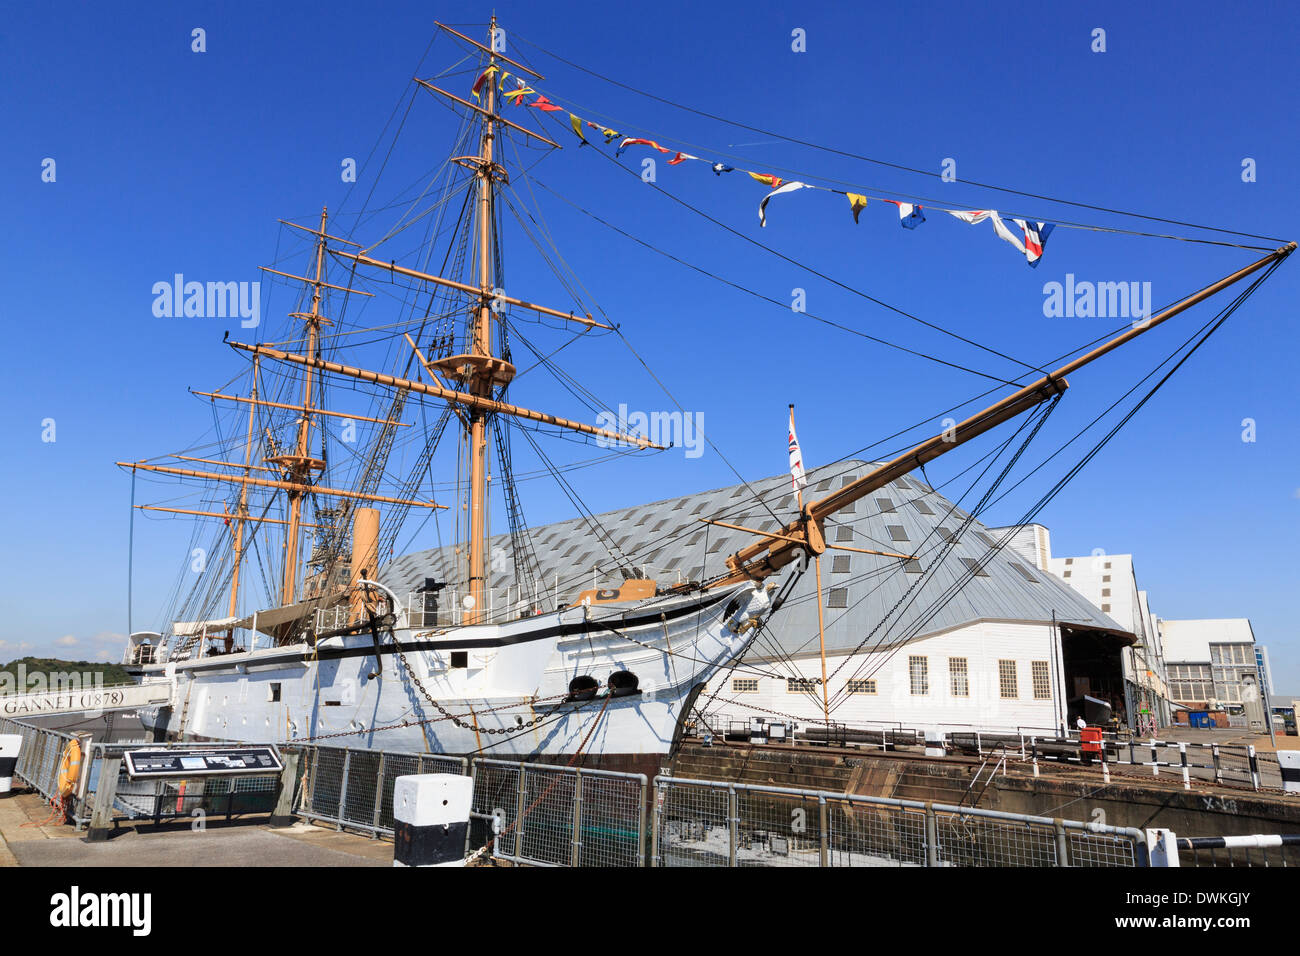 19th century sailing sloop HMS Gannet at maritime heritage museum in Historic Dockyard at Chatham, Kent, England, UK, Britain - Stock Image